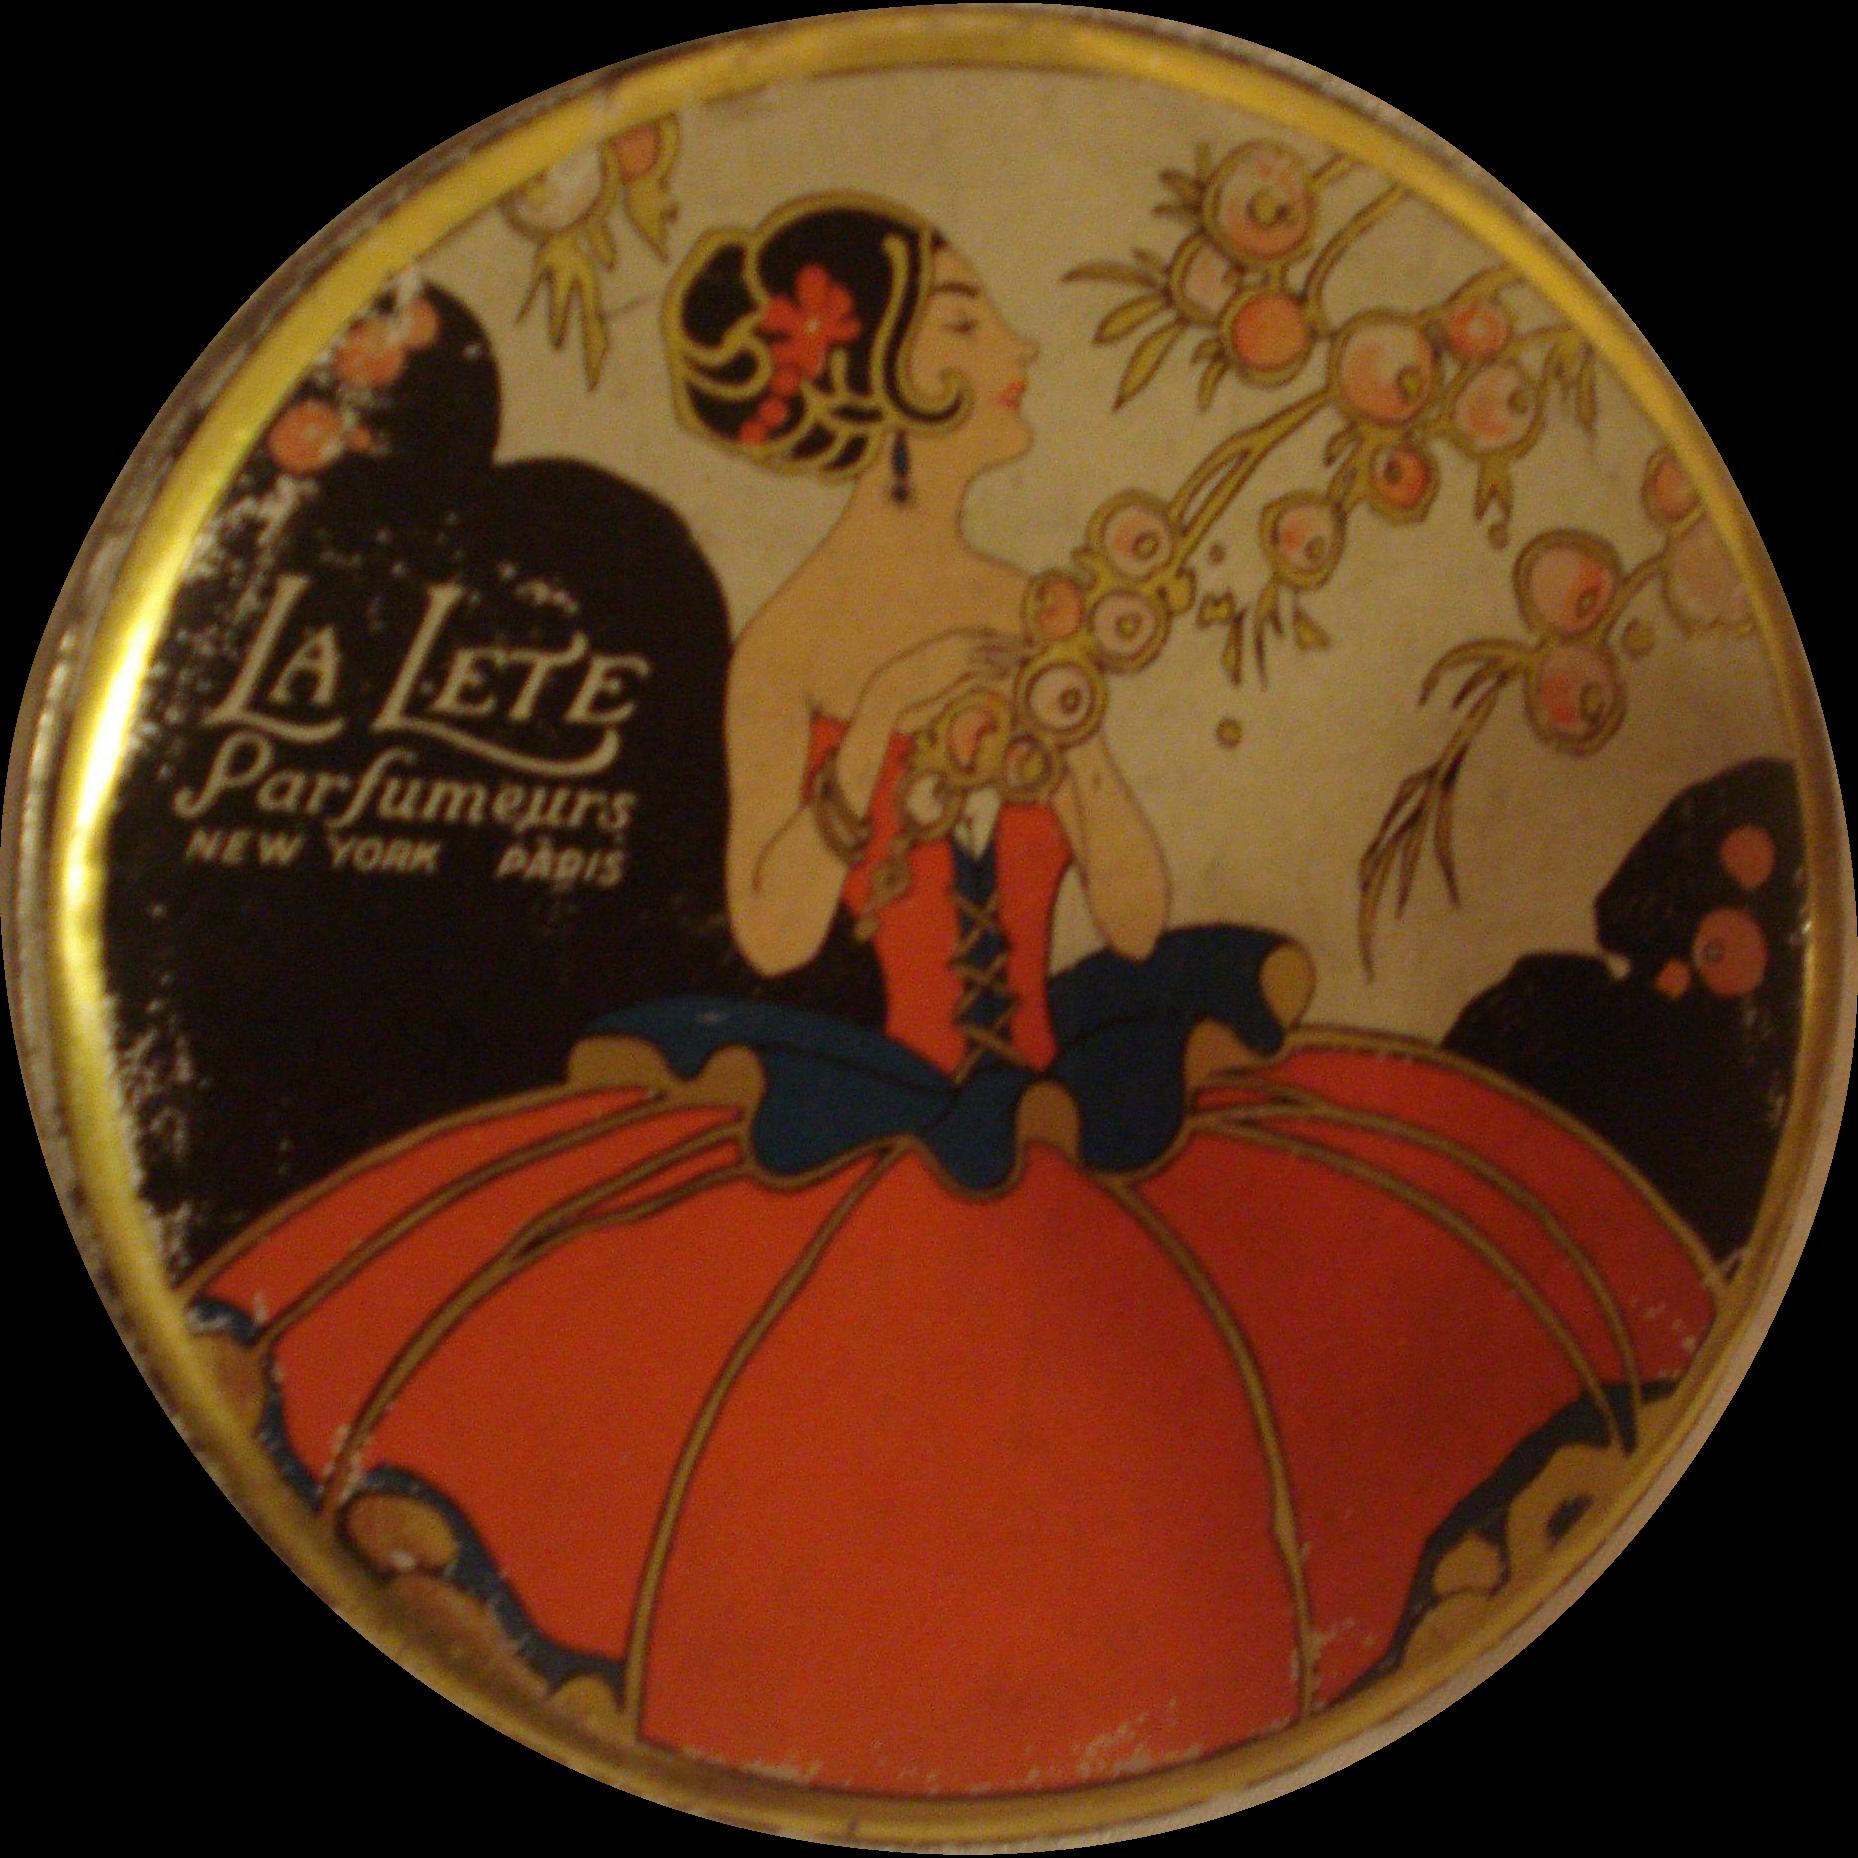 Vintage Powder Tin La Lete